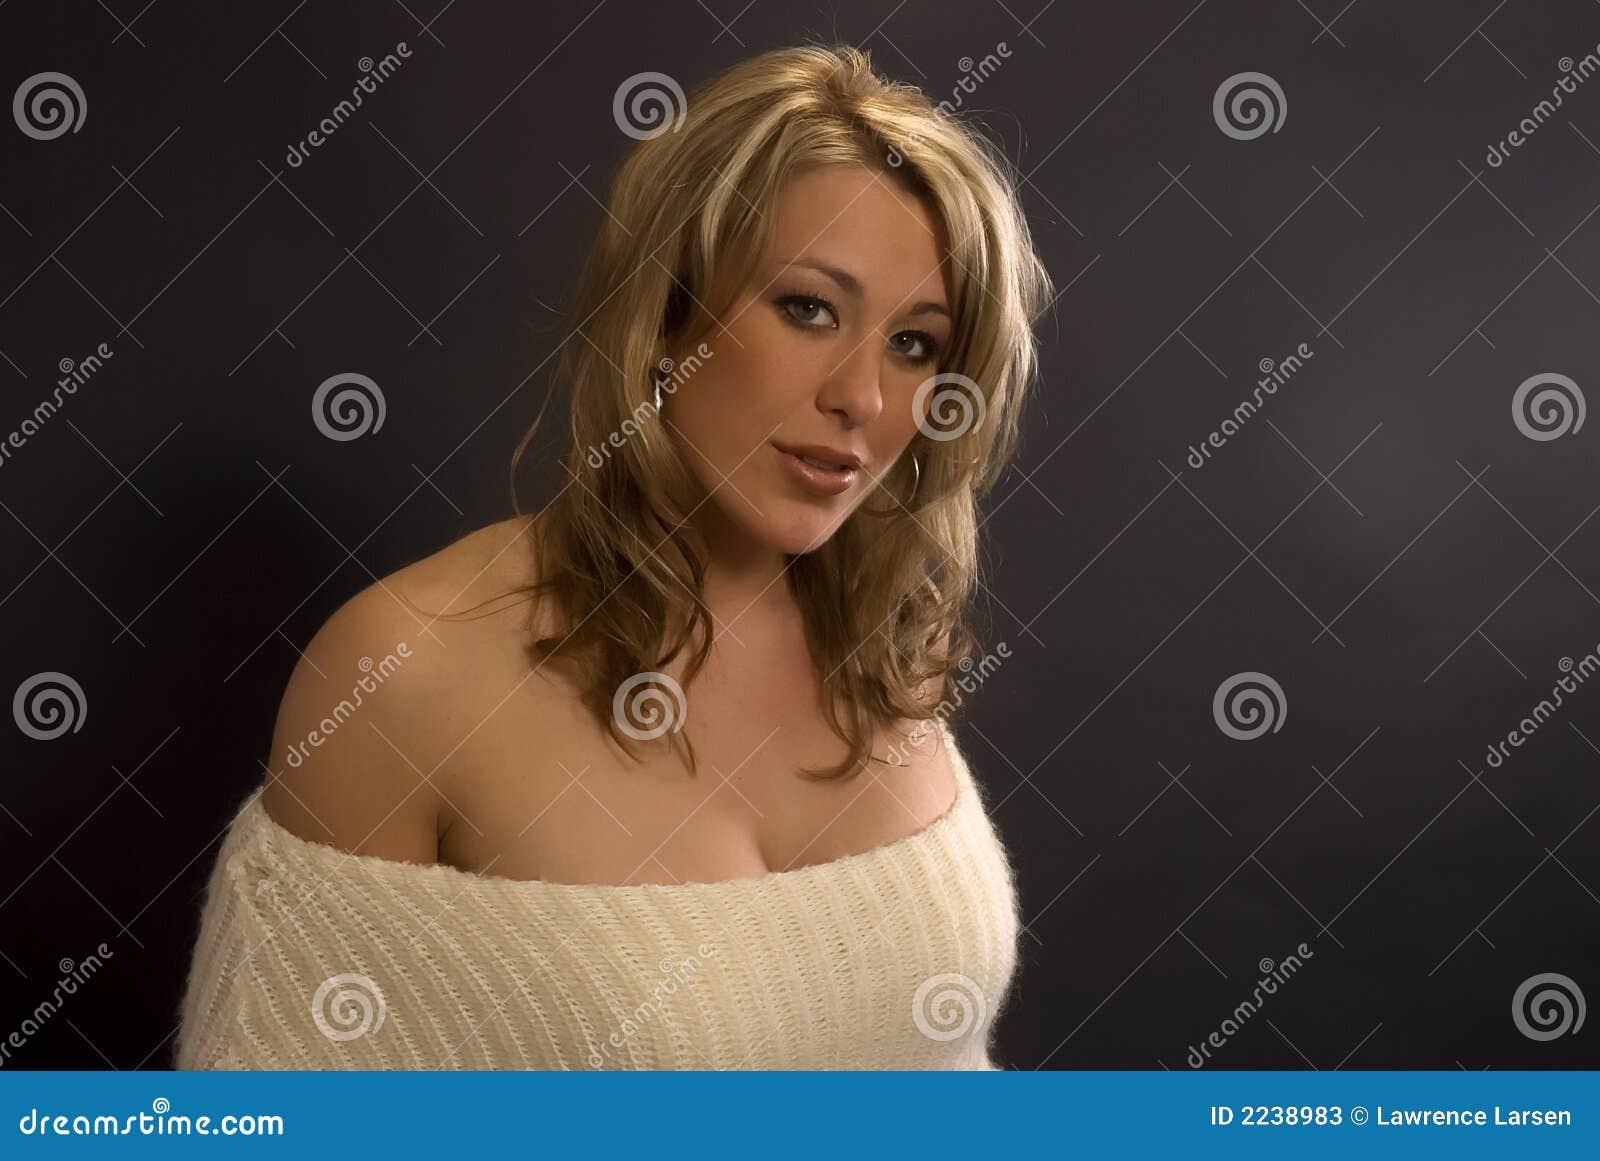 Vrouw in sweater met terughoudende blik